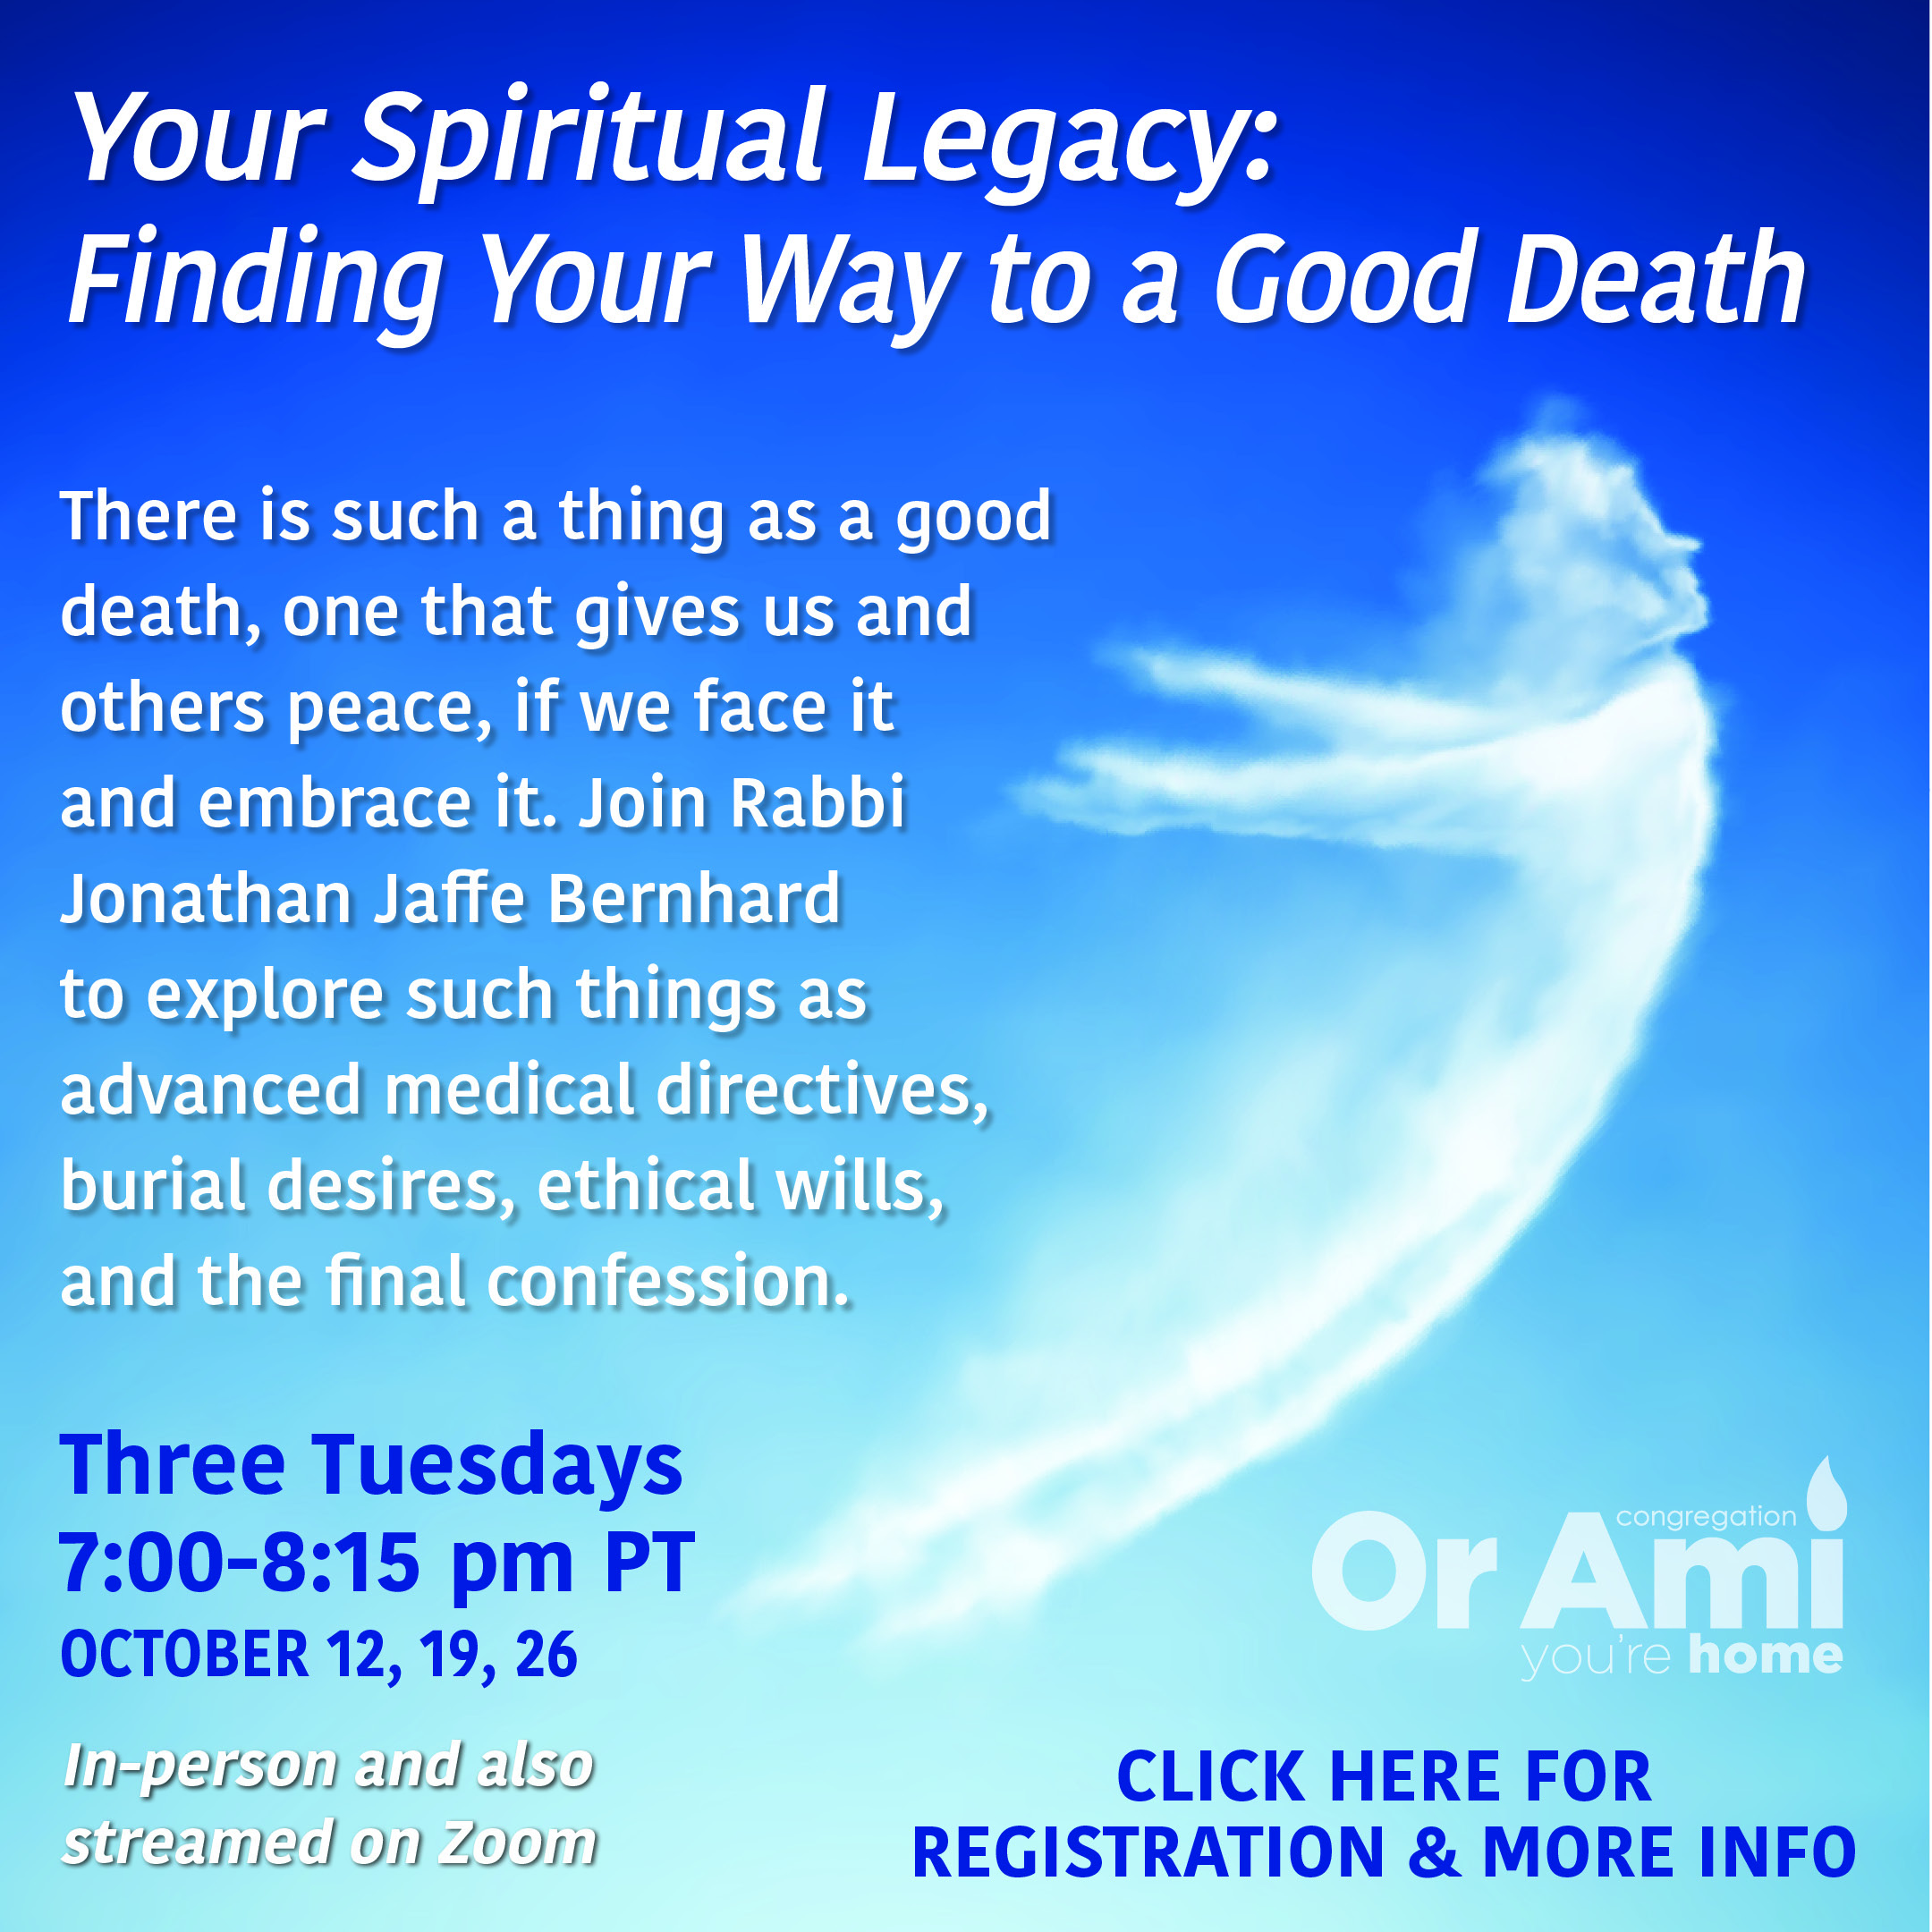 Or Ami Your Spiritual Legacy 2021 CLICK